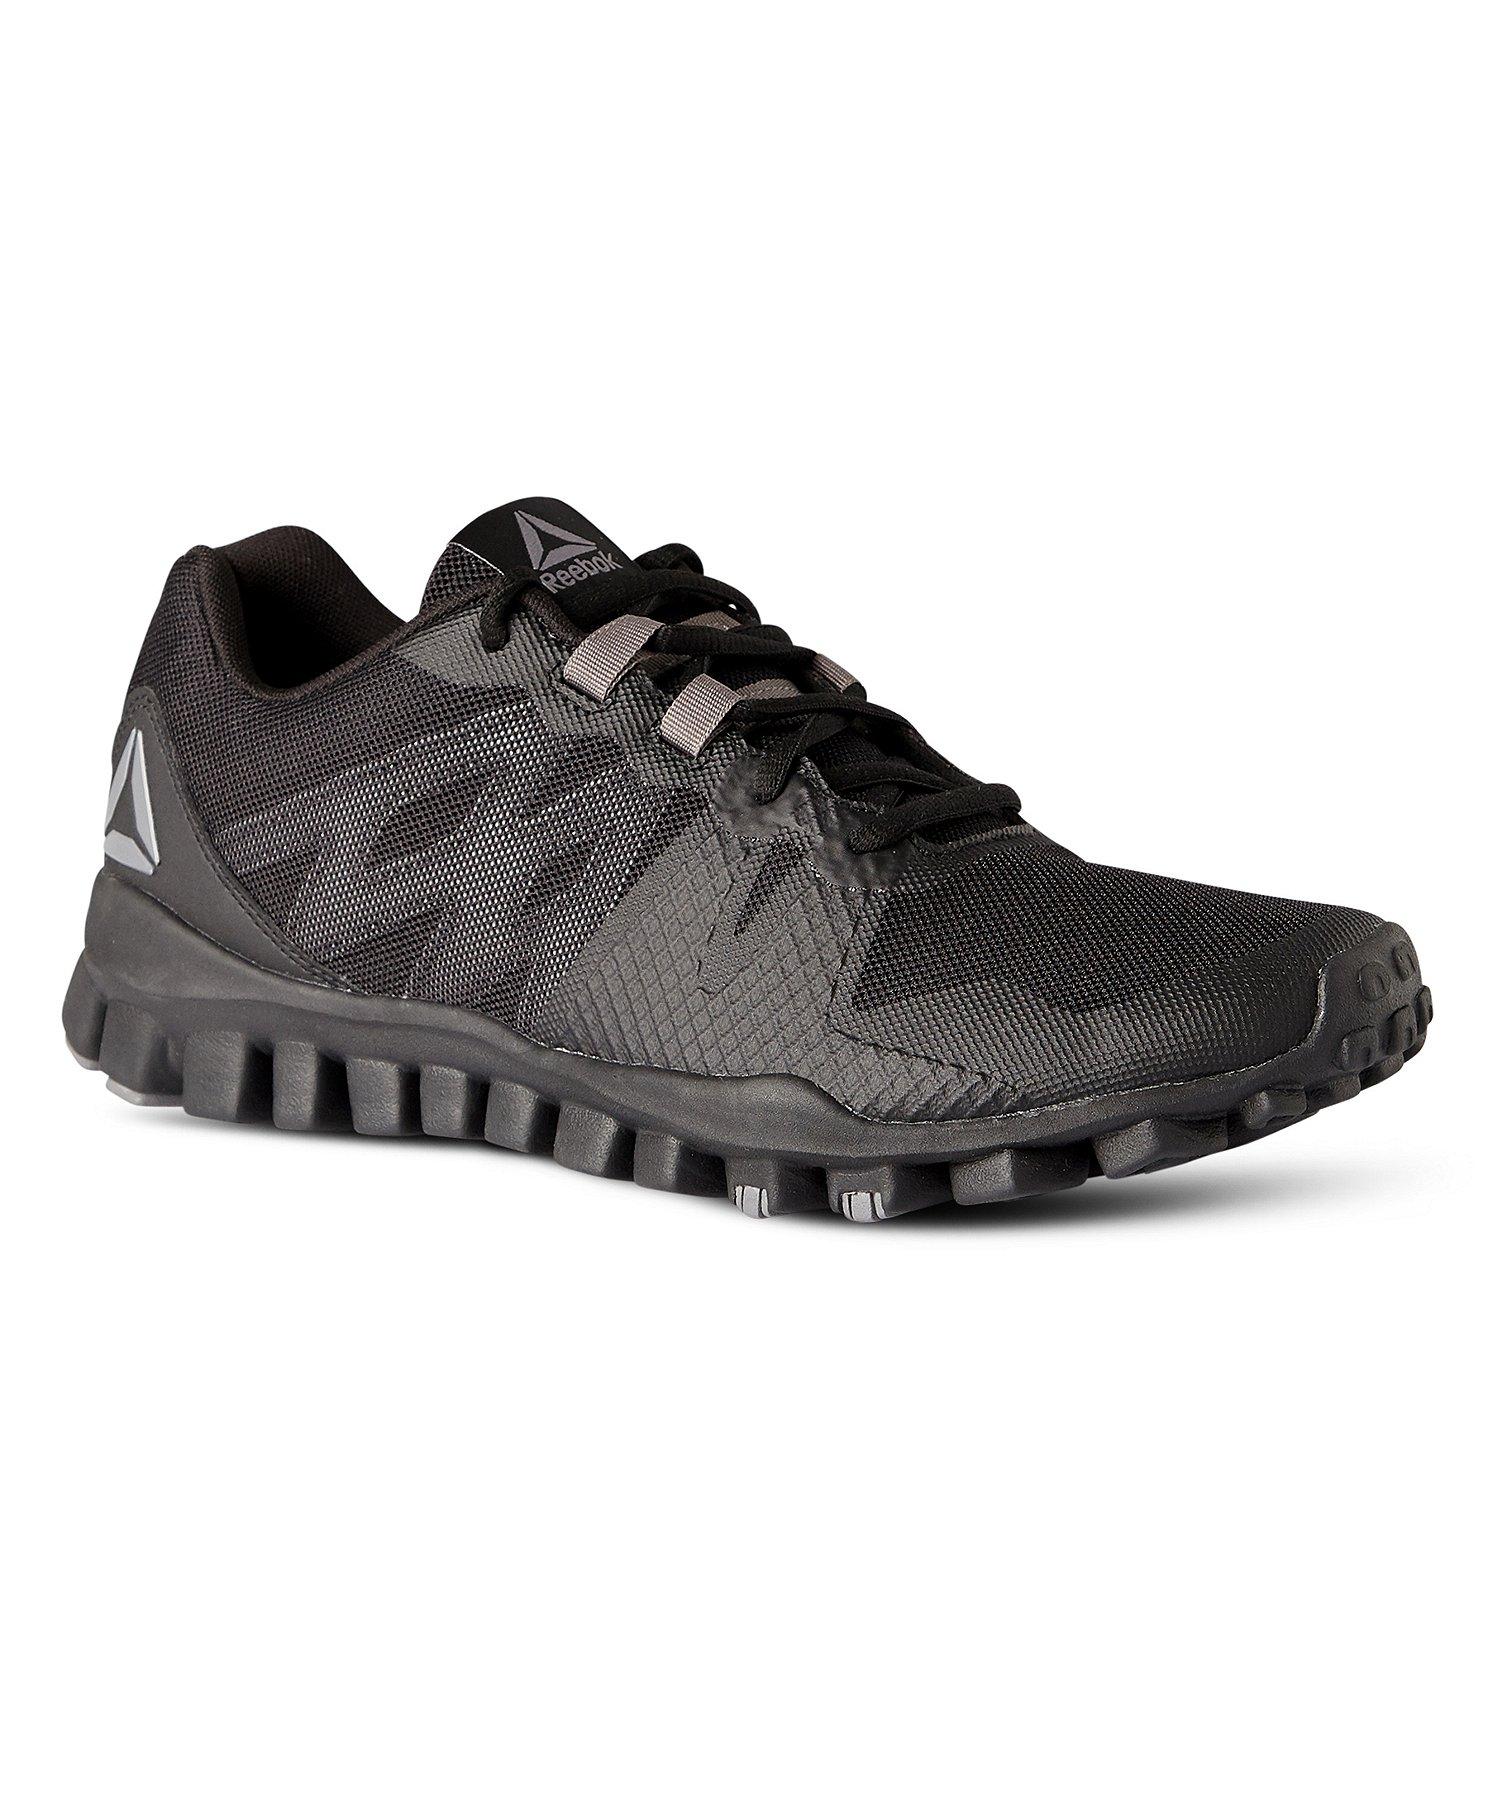 homme chaussures reebok amincissante chaussures chaussures reebok reebok amincissante homme amincissante chaussures homme LUpzVjSqMG